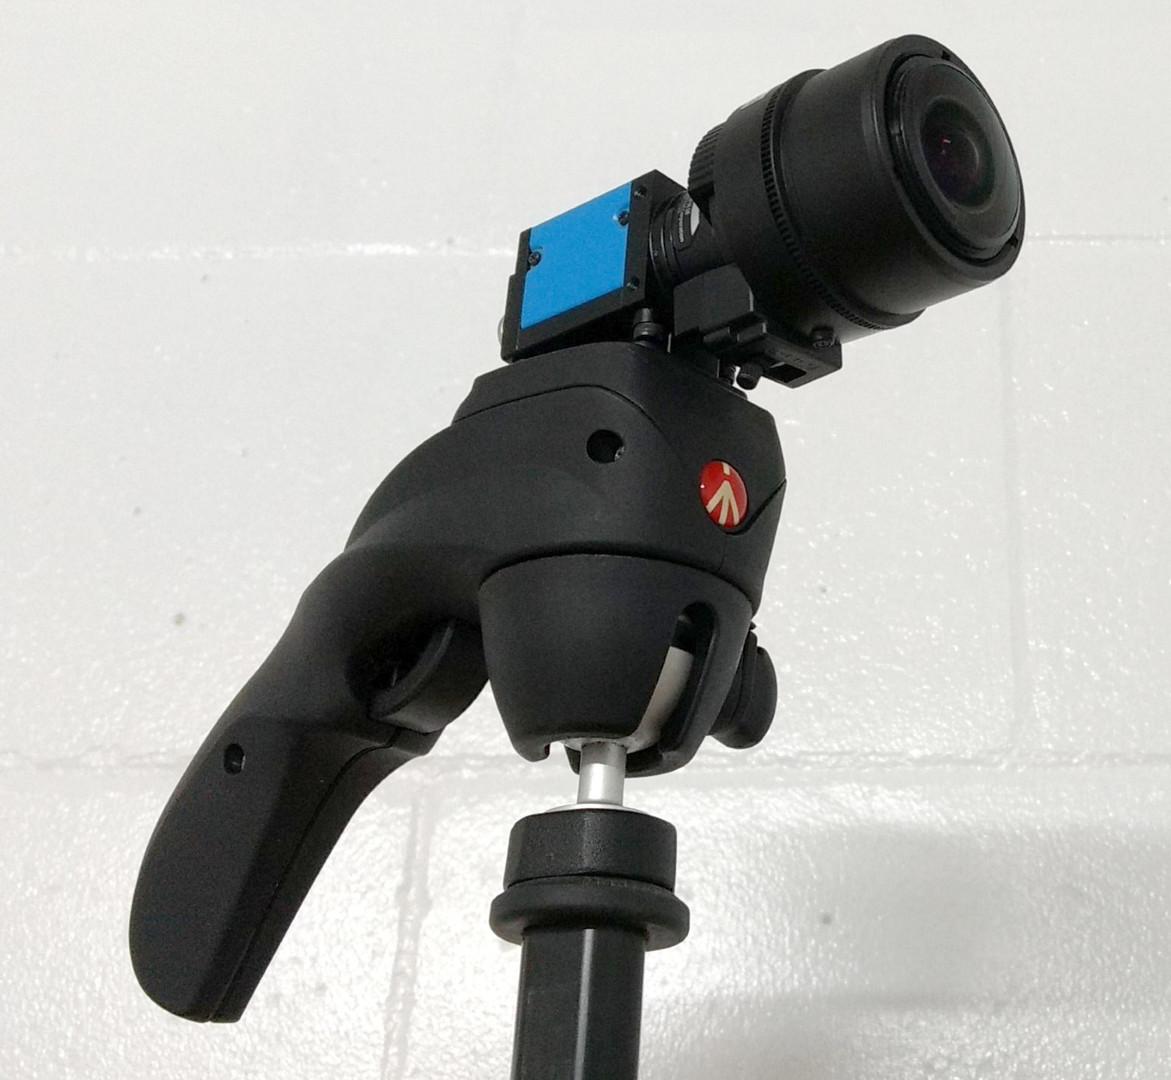 GigE camera on tripod